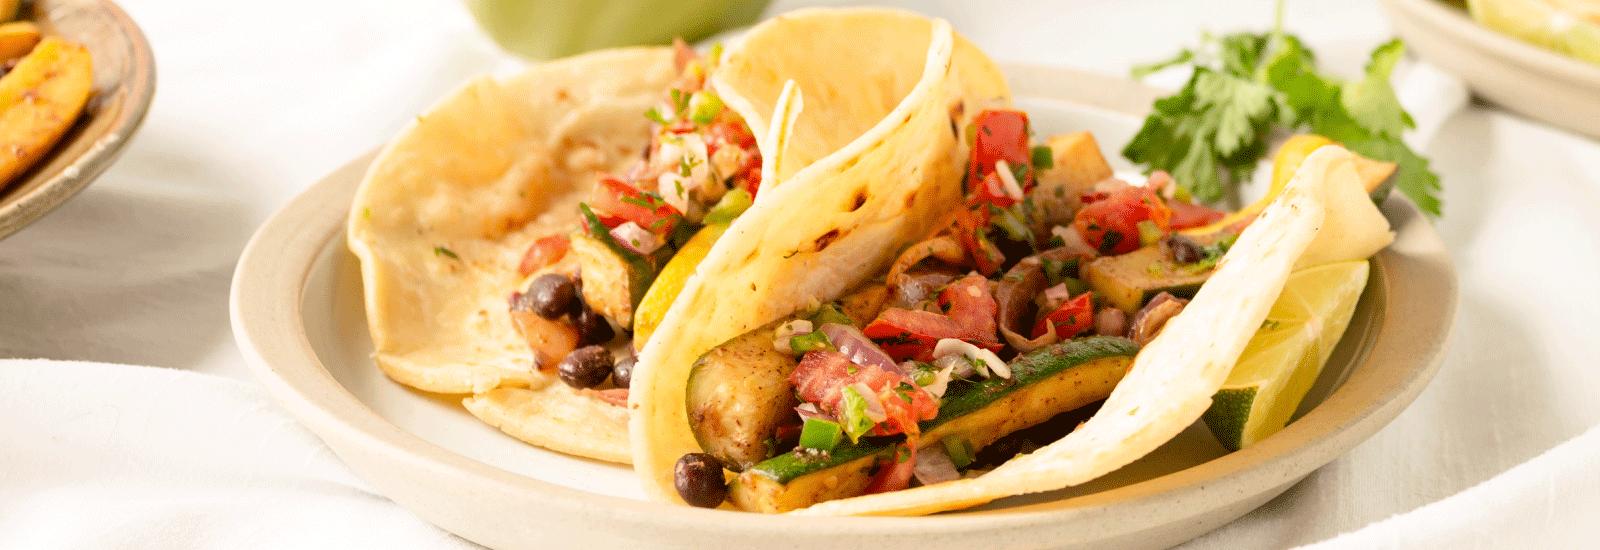 Mexican Restaurants near Nellis AFB